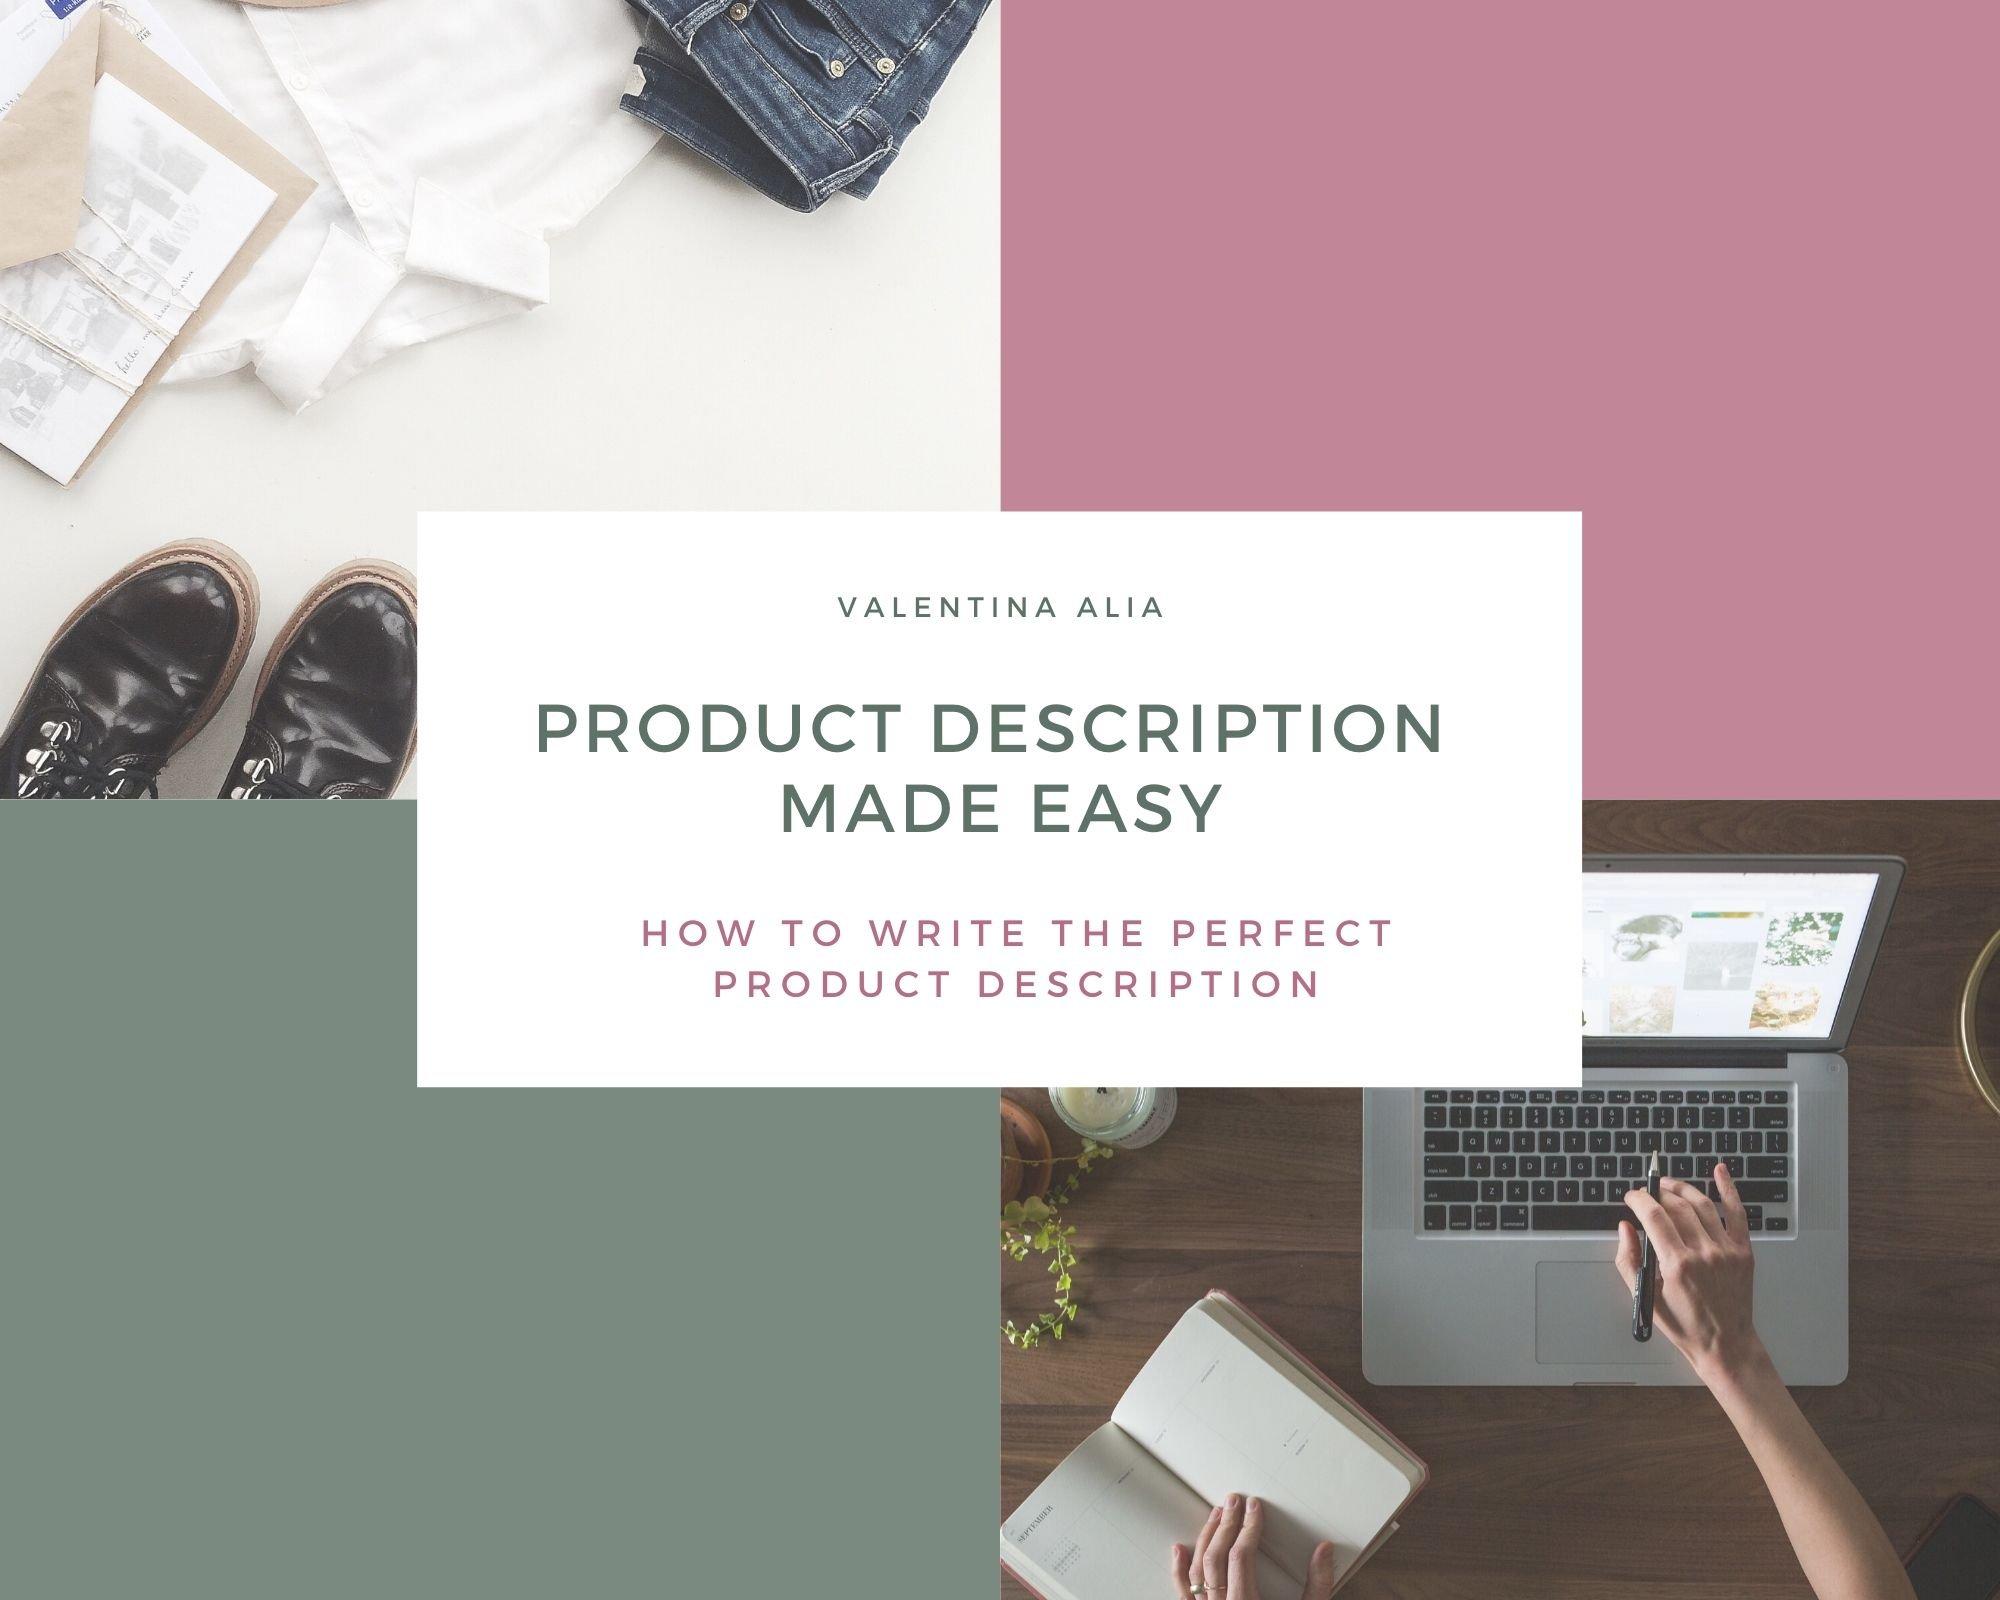 Valentina Alia translator - Product description